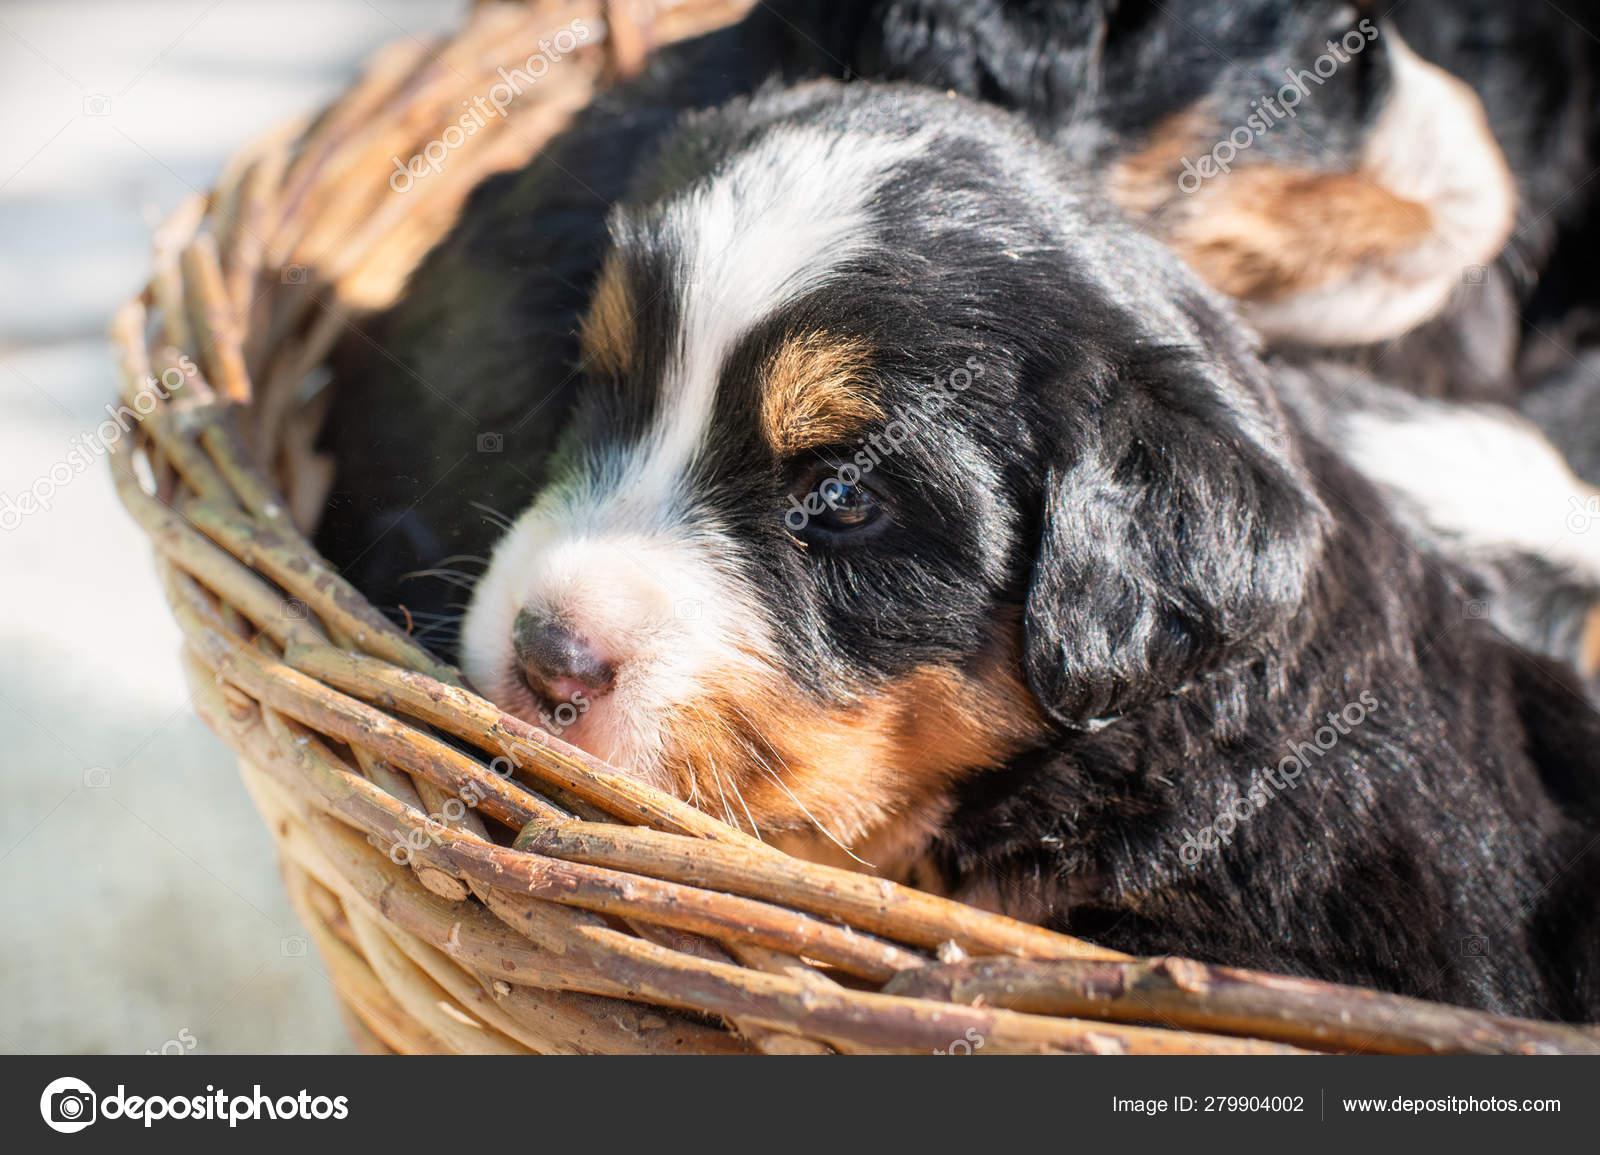 Cute Bernese Mountain Dogs Puppies Stock Photo C Fotokostic 279904002